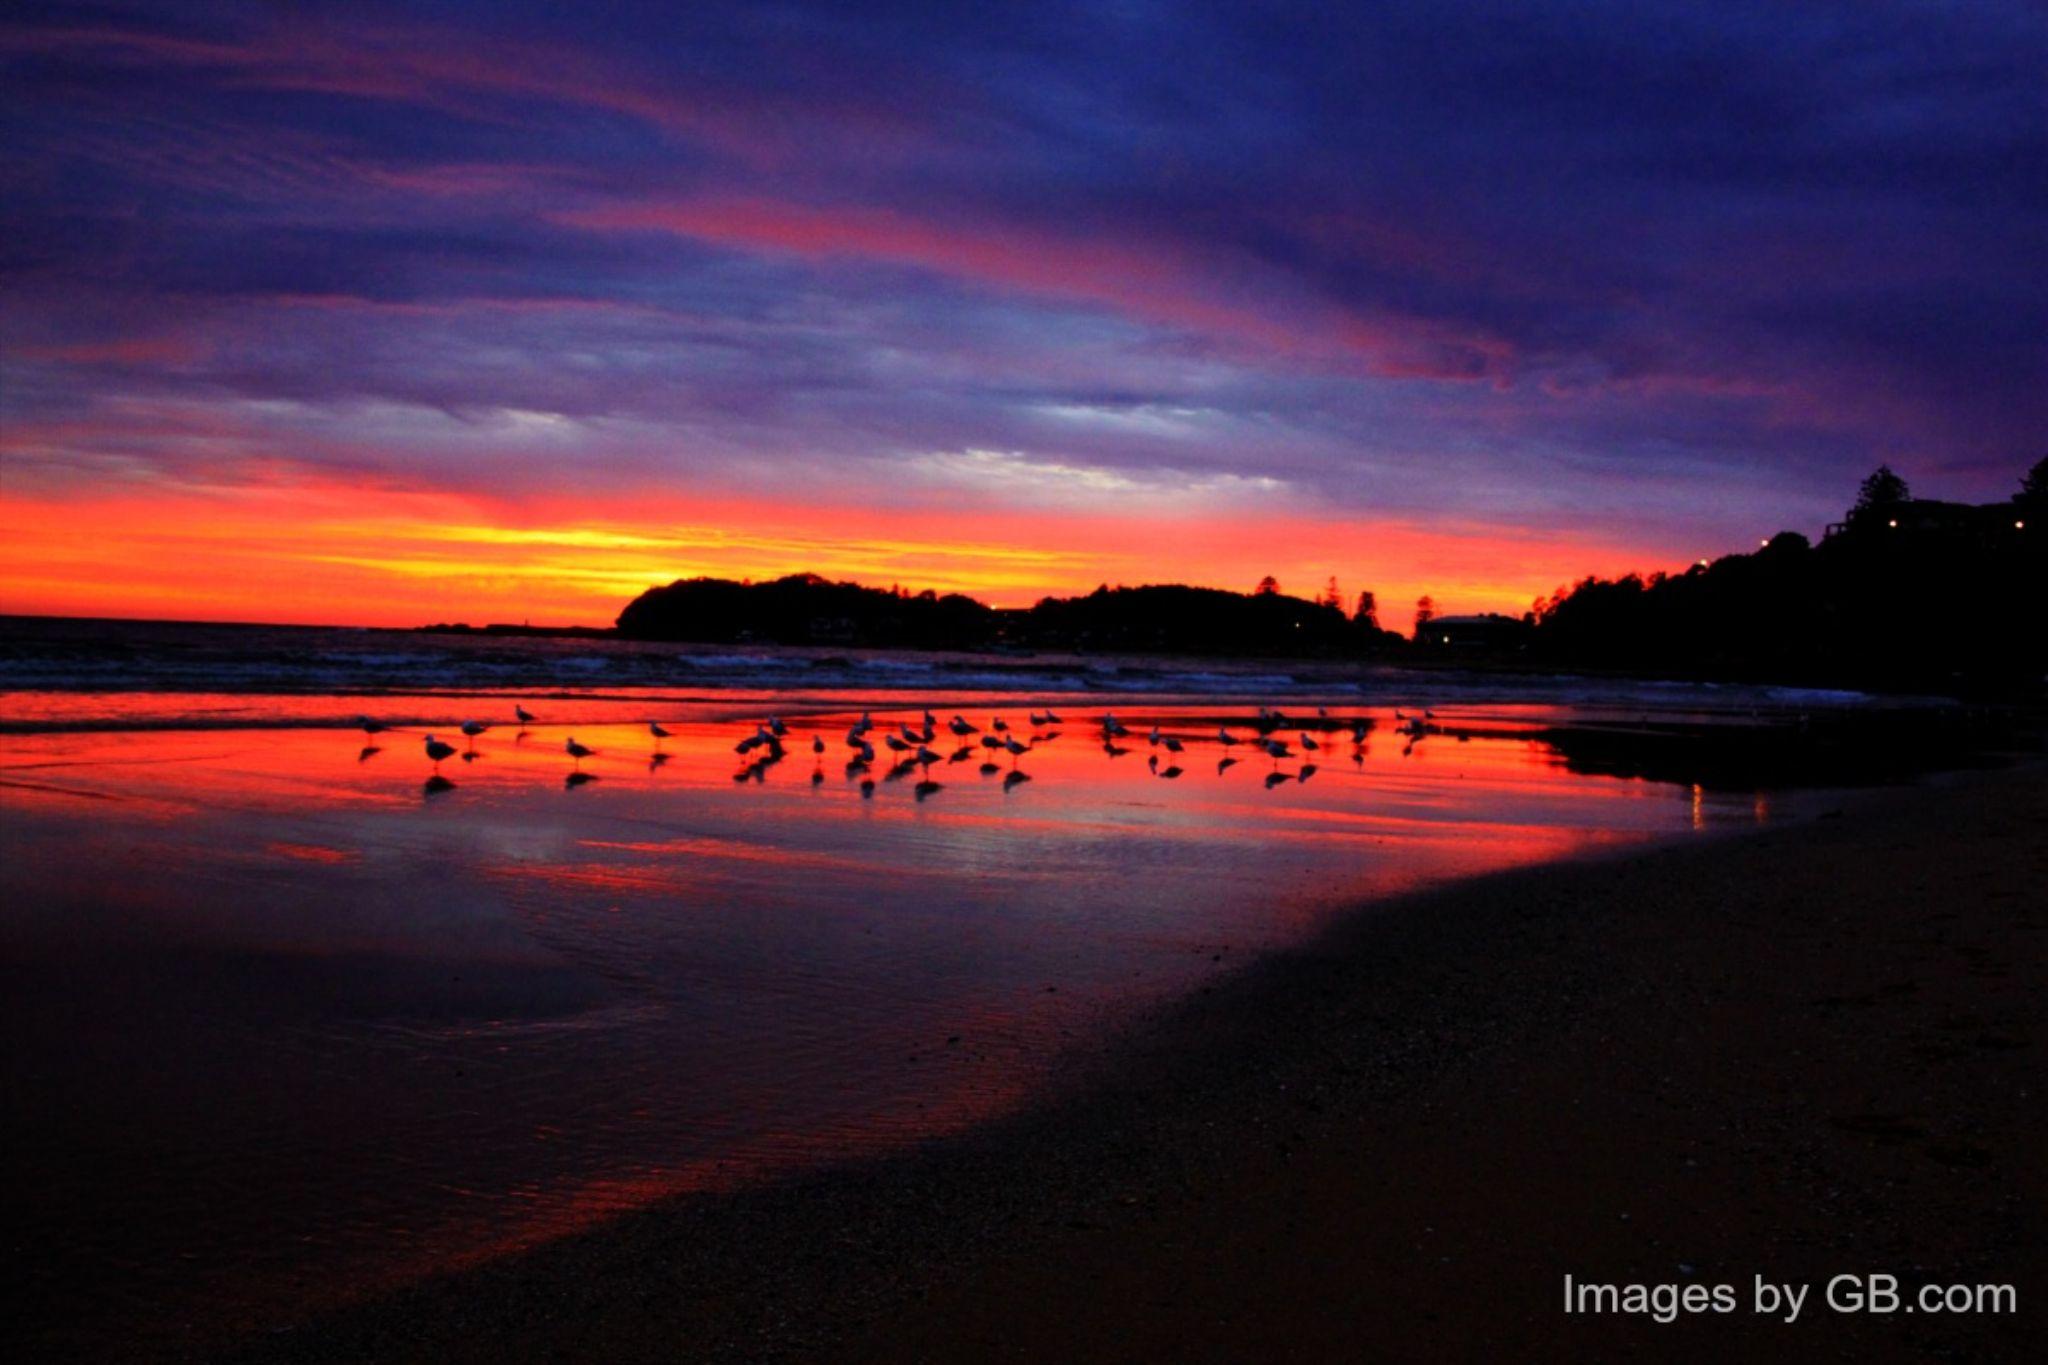 Seagulls at Sunrise by gazzab1712